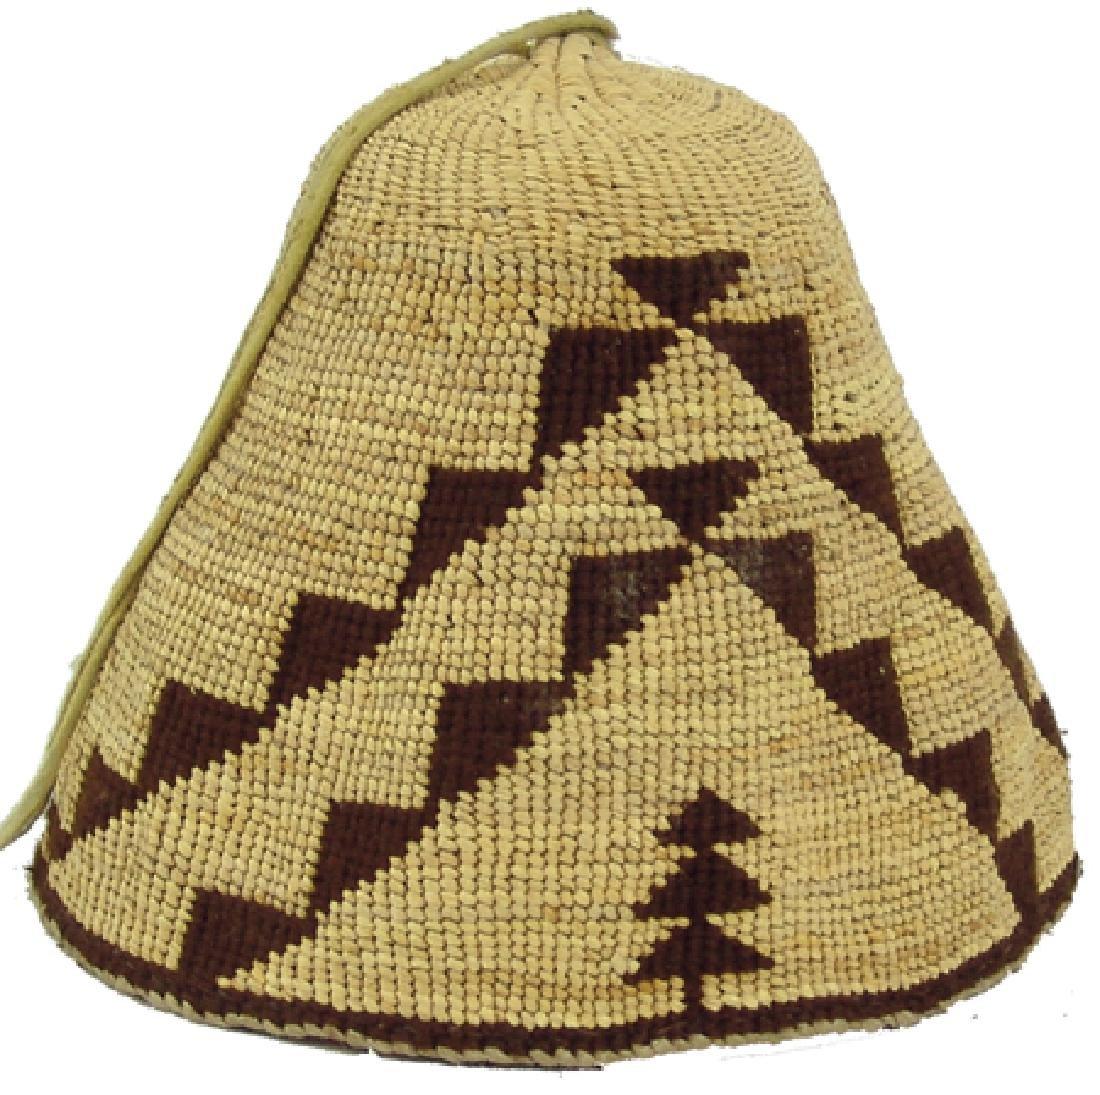 Nez Perce Basketry Hat